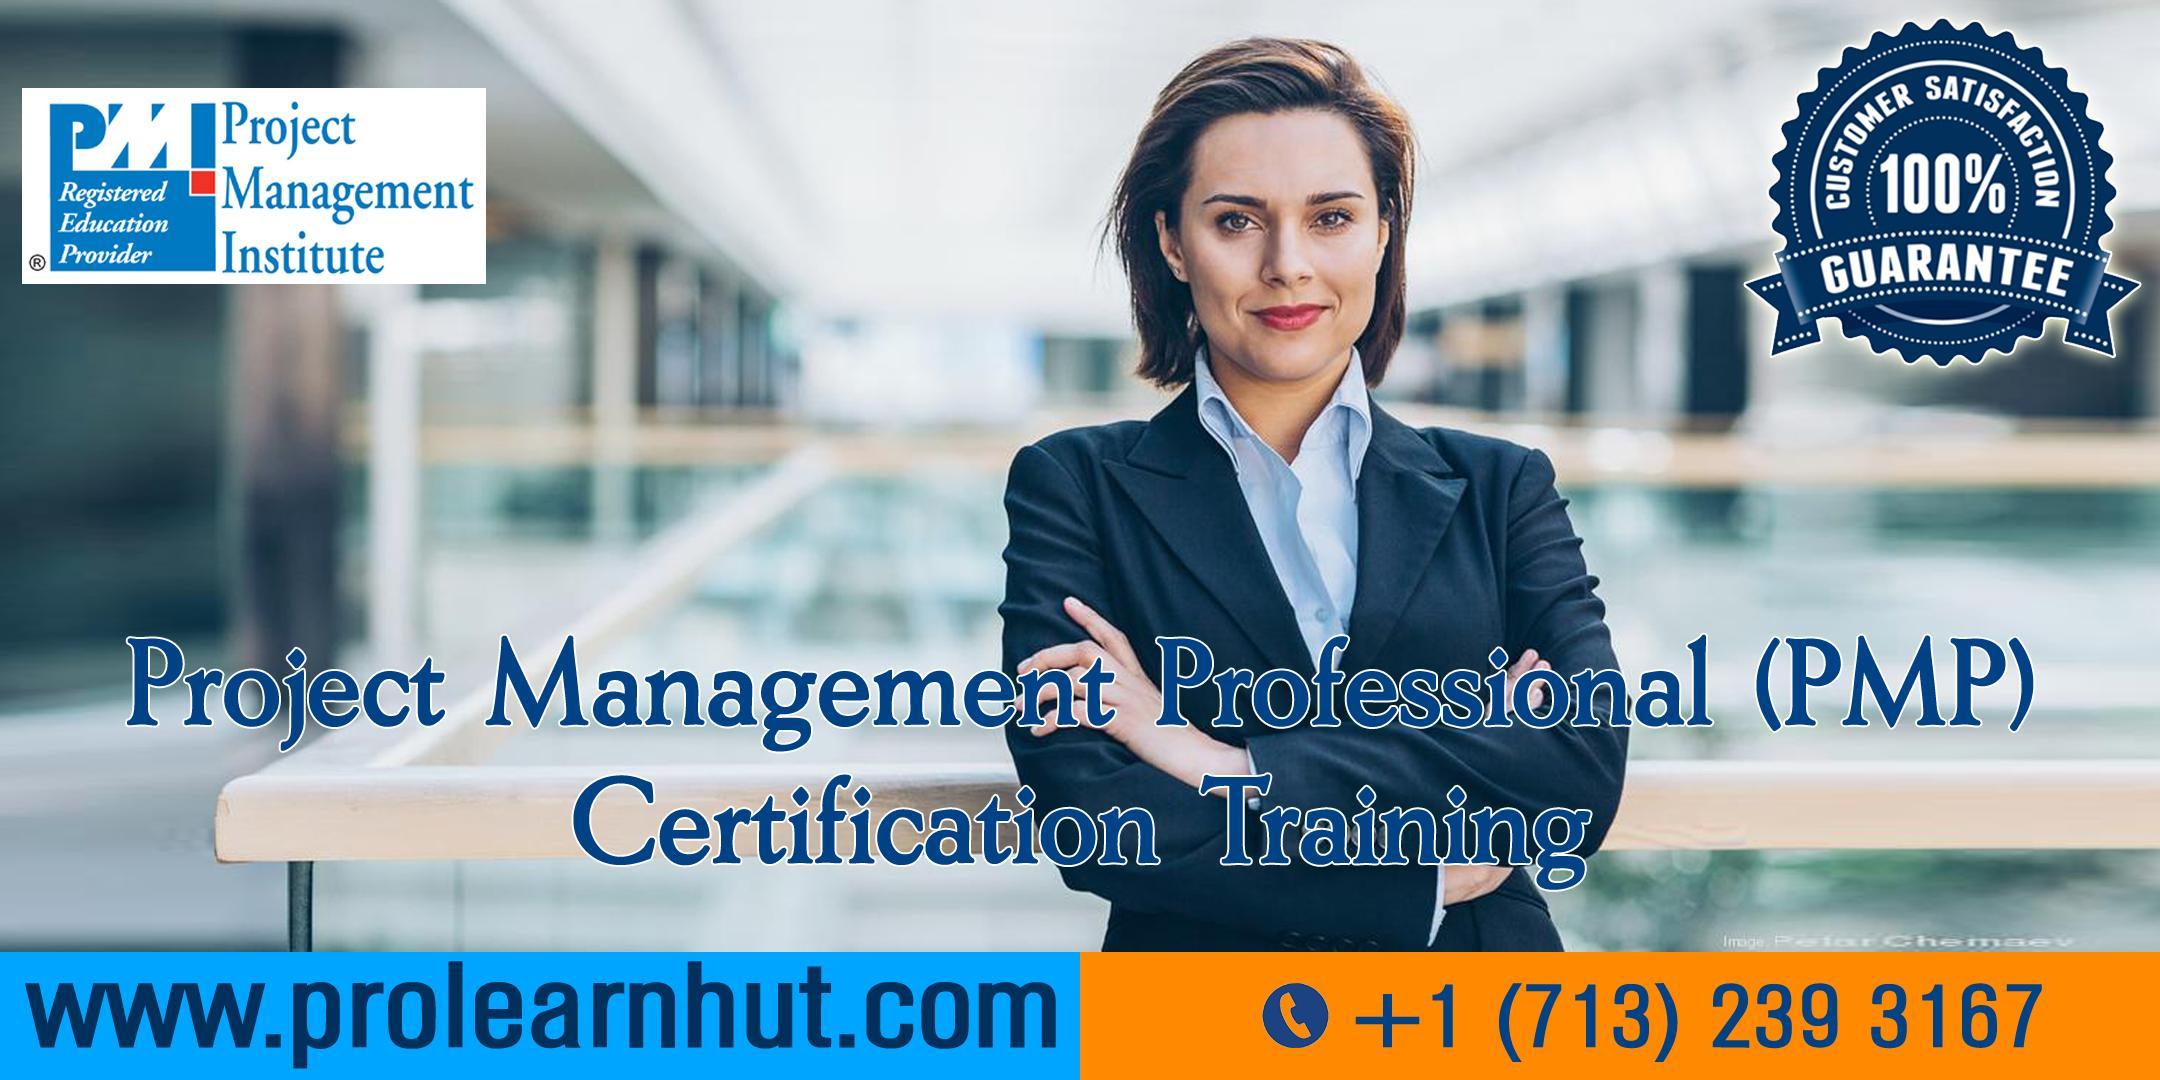 PMP Certification | Project Management Certification| PMP Training in Elizabeth, NJ | ProLearnHut